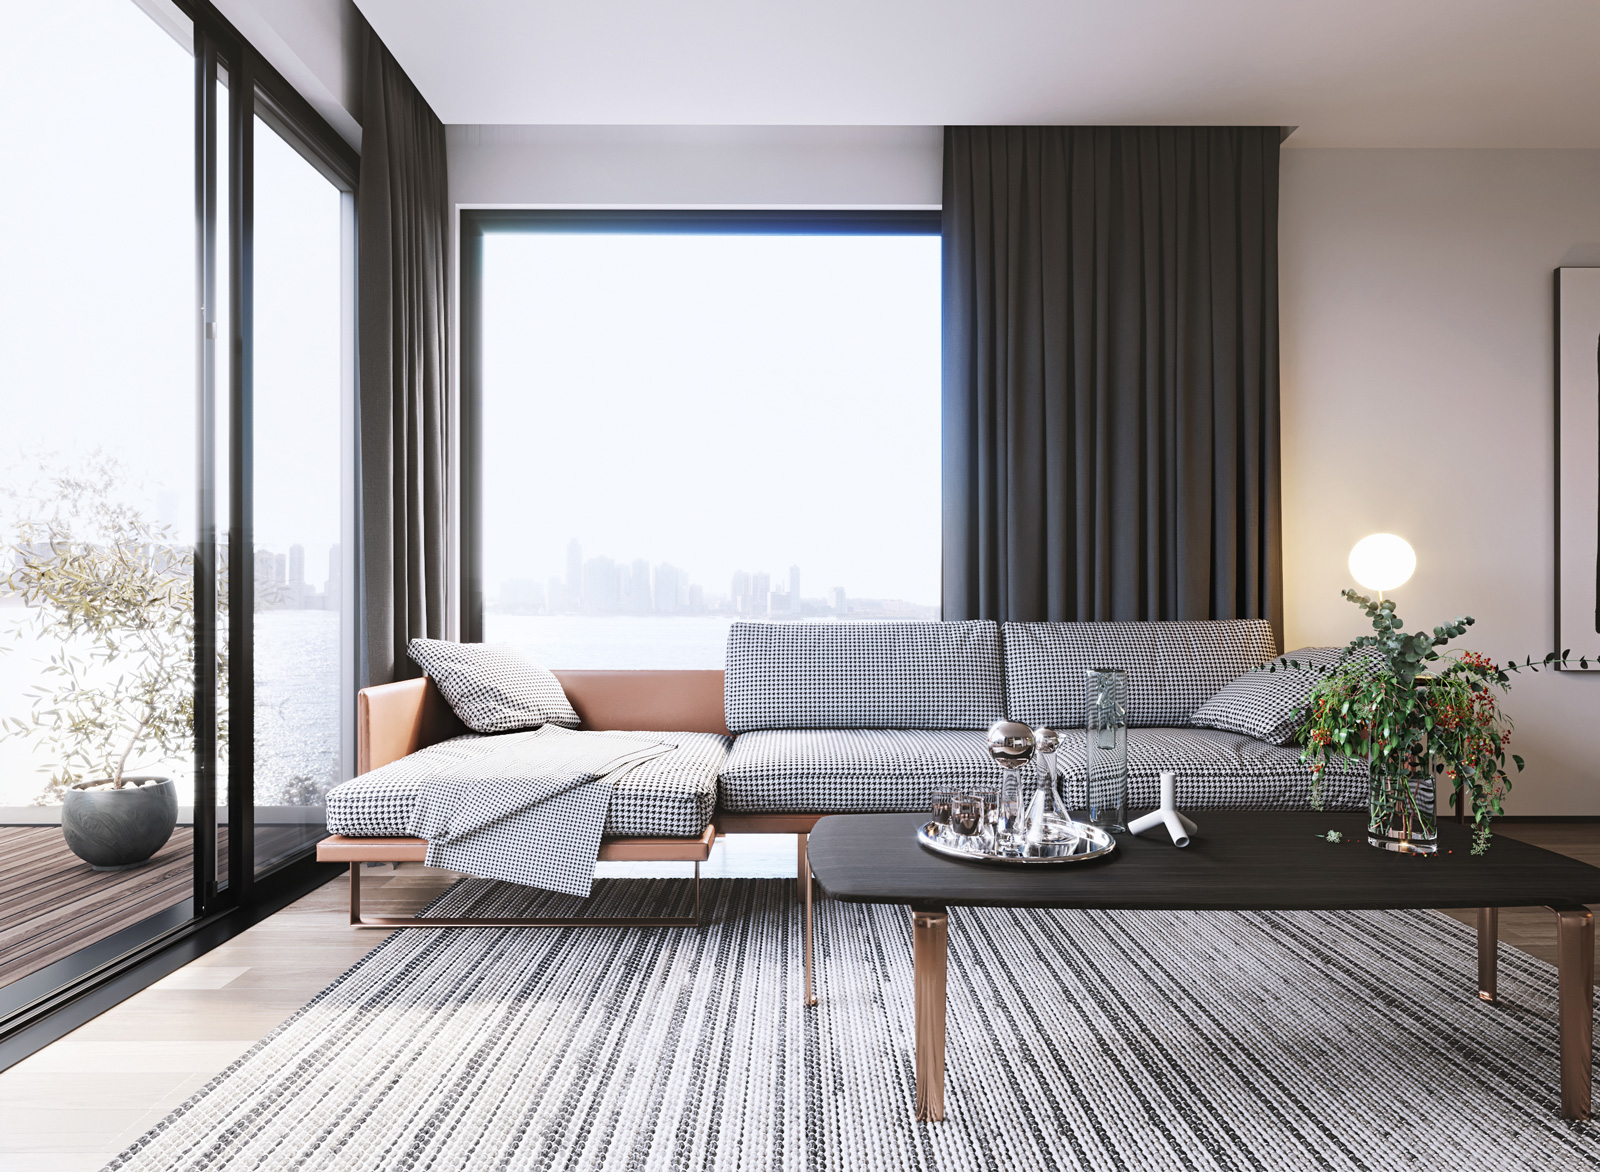 Residential Home - Equilibrium